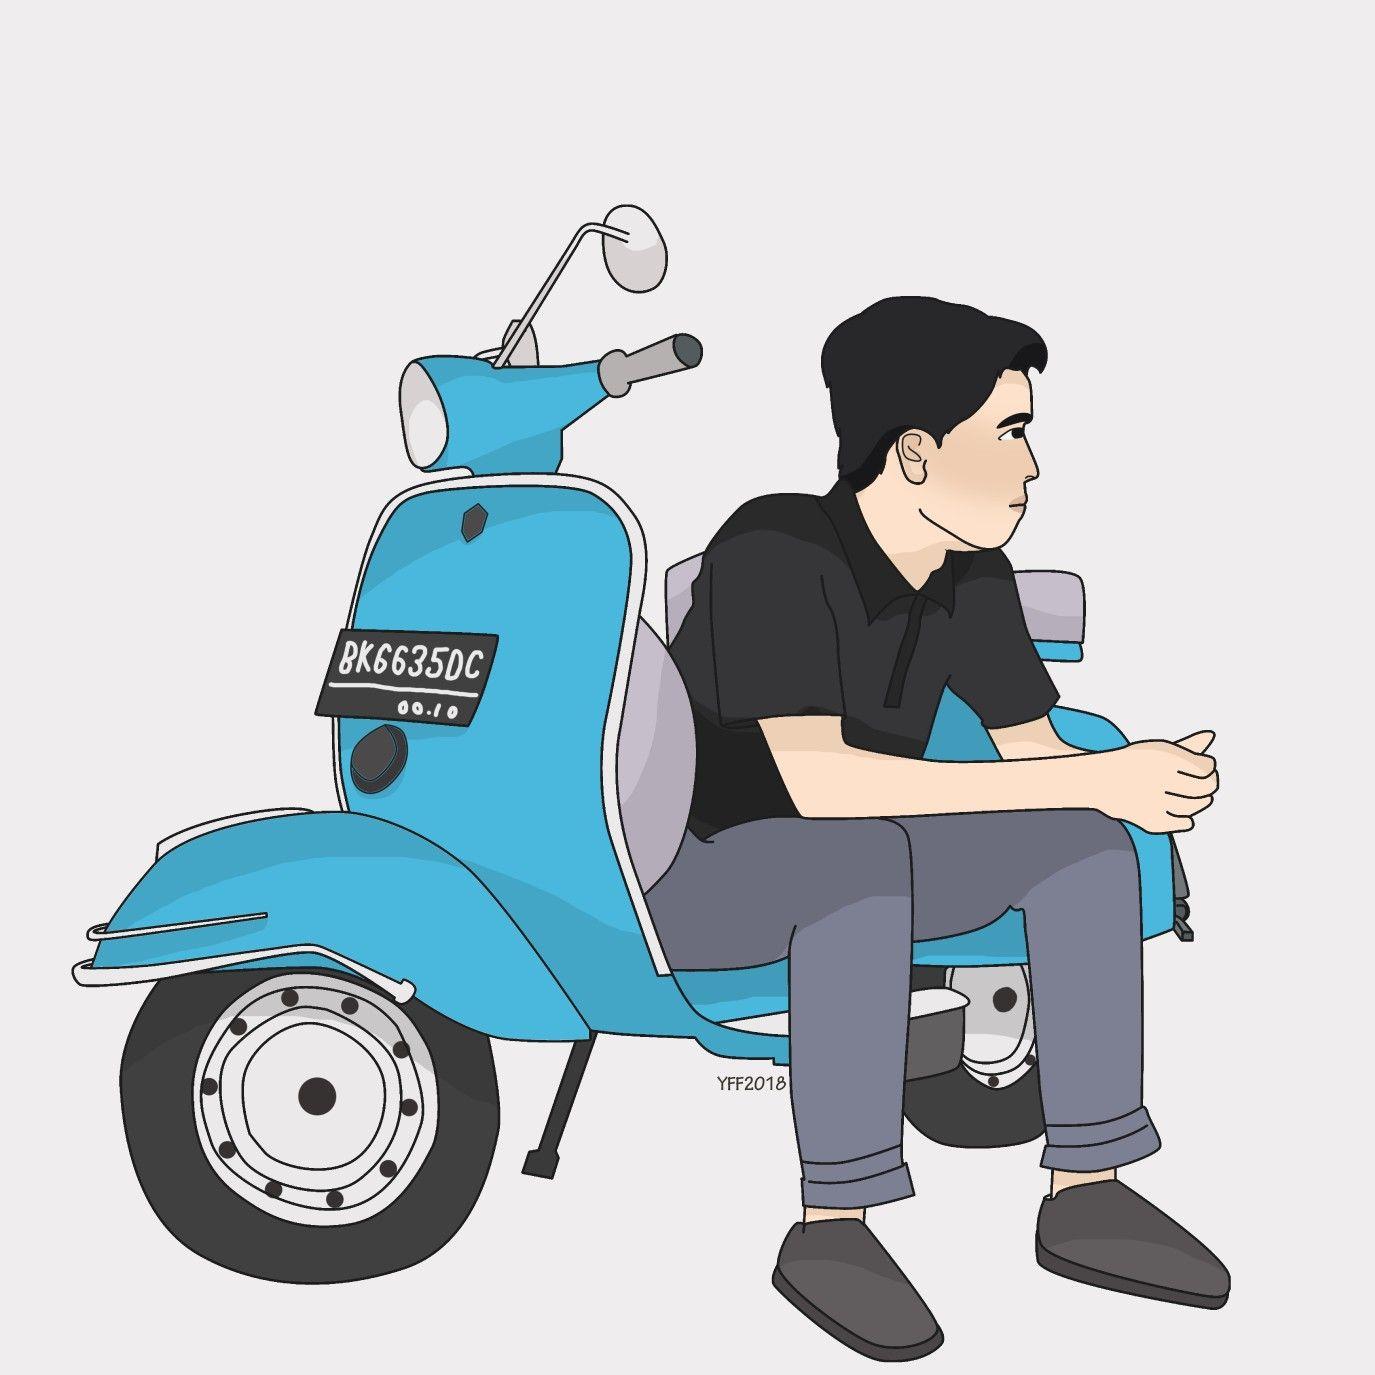 Gambar Animasi Motor Vespa